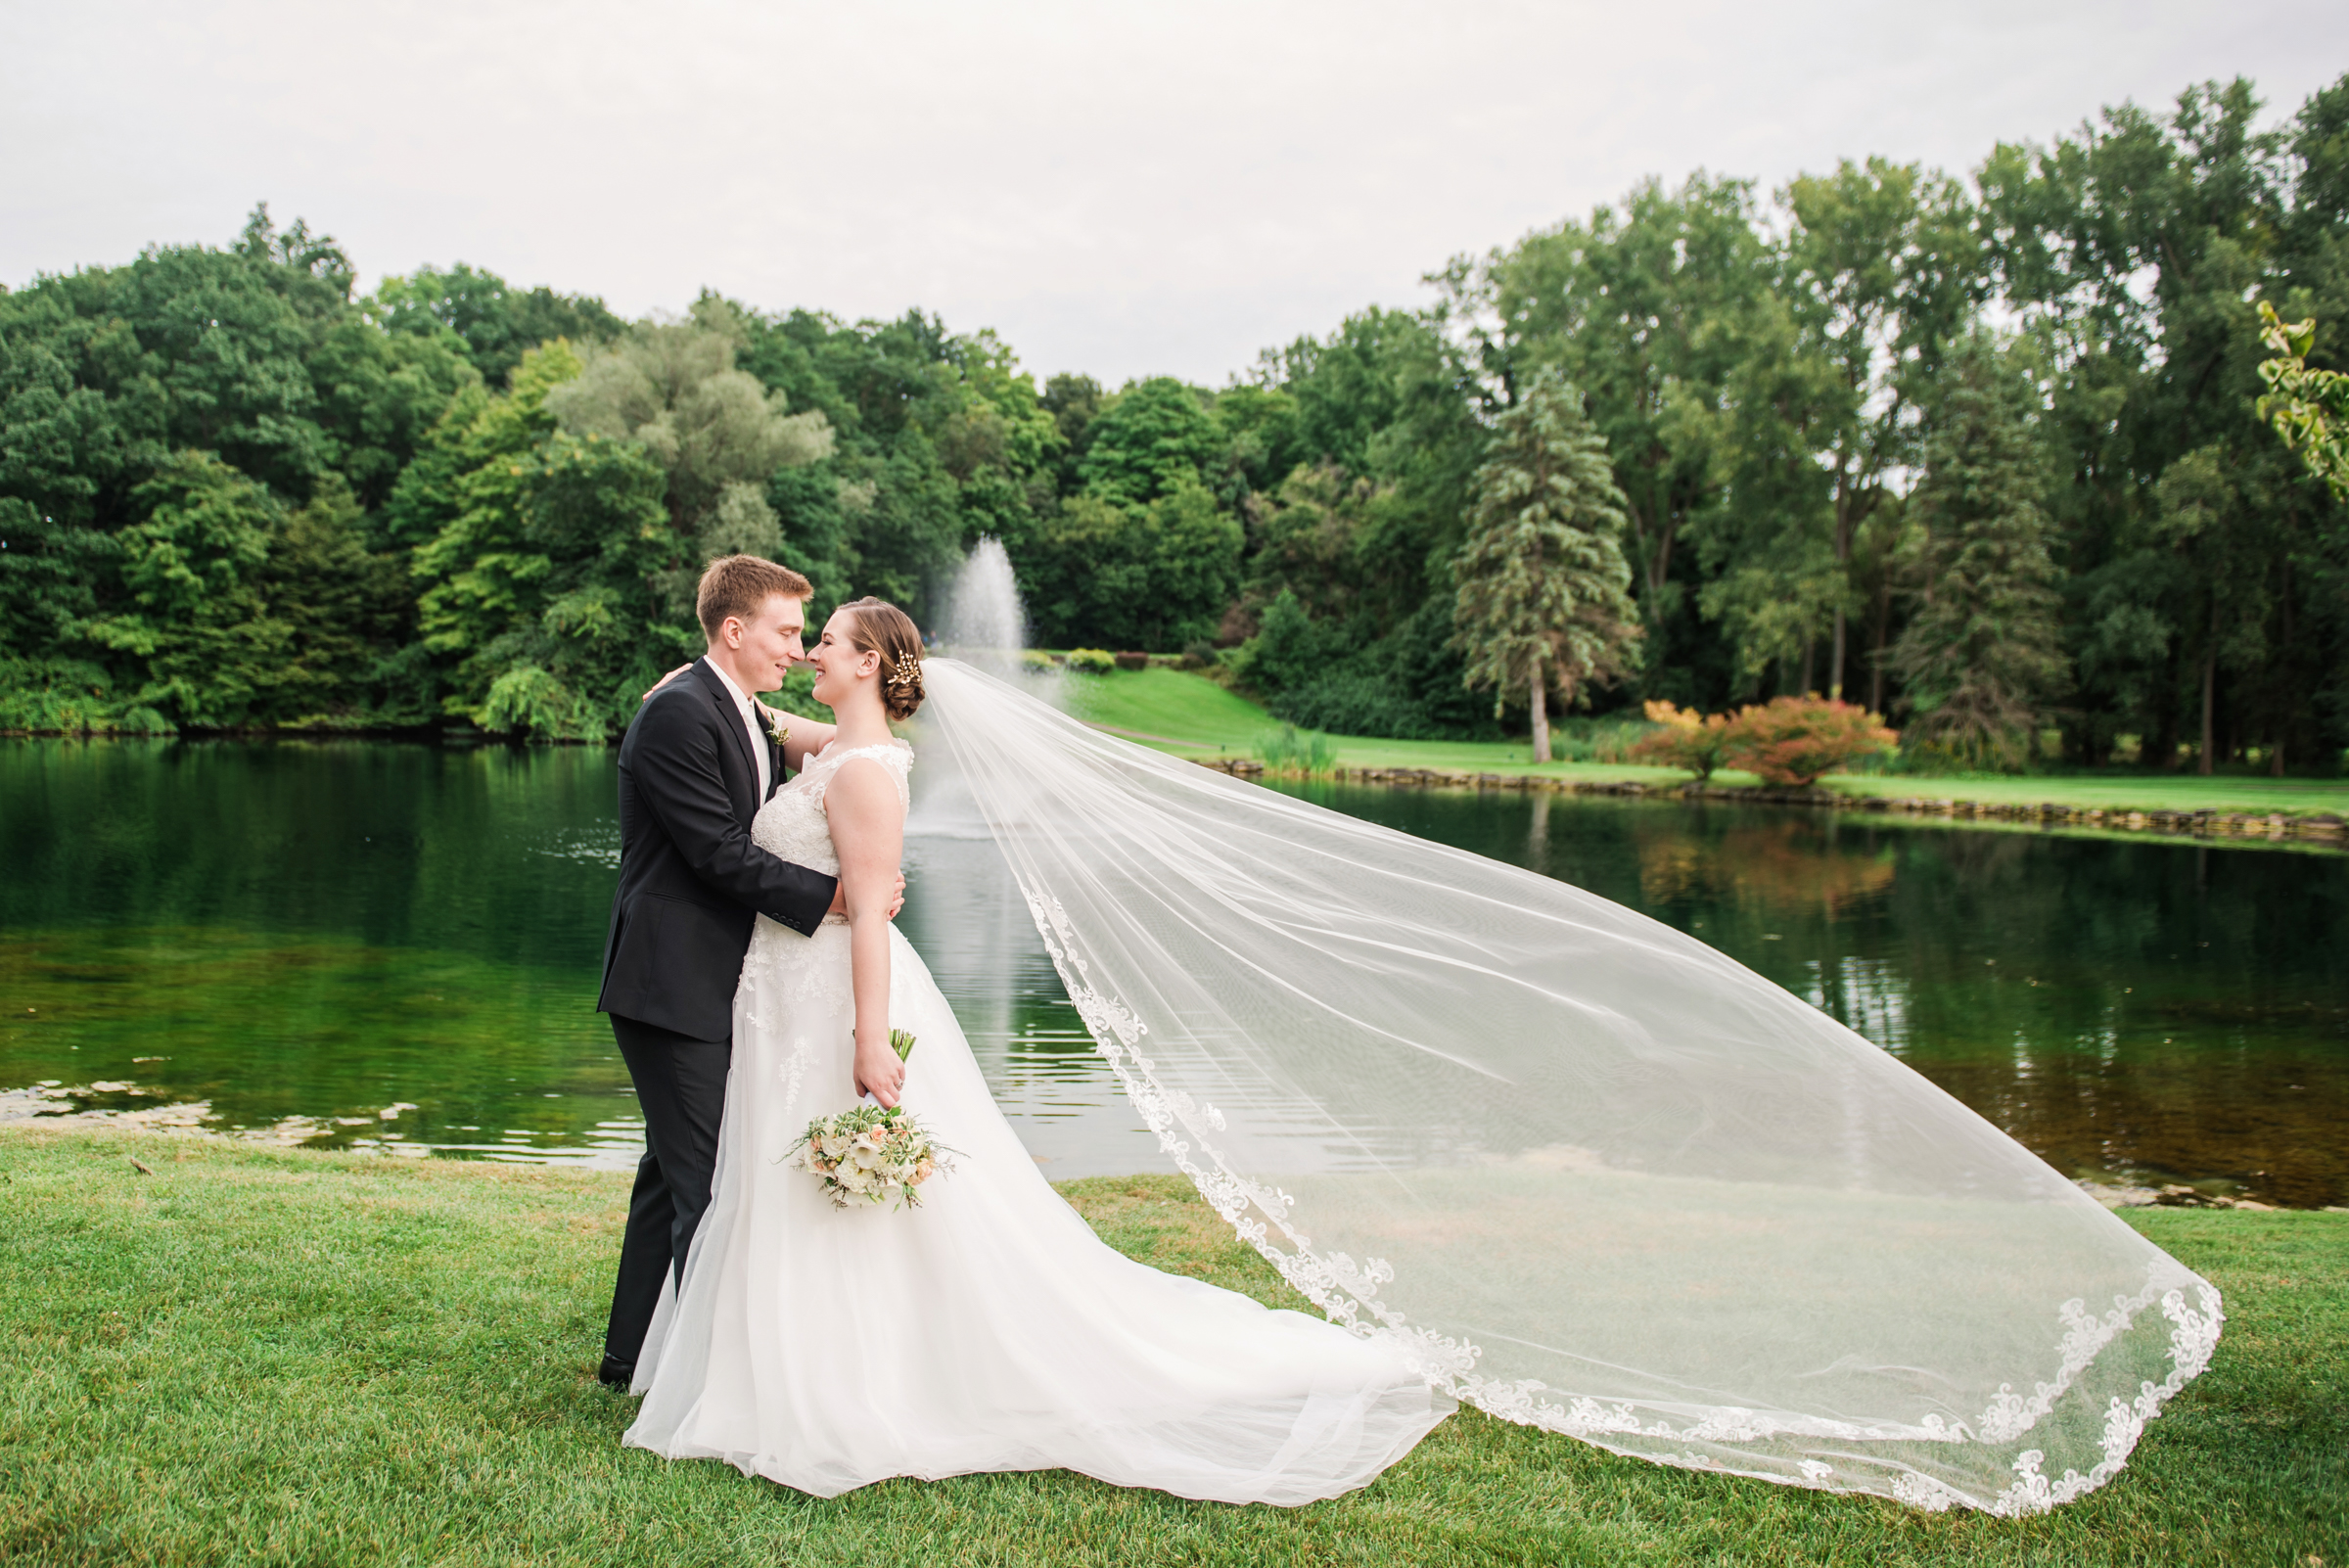 Shadow_Lake_Rochester_Wedding_JILL_STUDIO_Rochester_NY_Photographer_DSC_4169.jpg